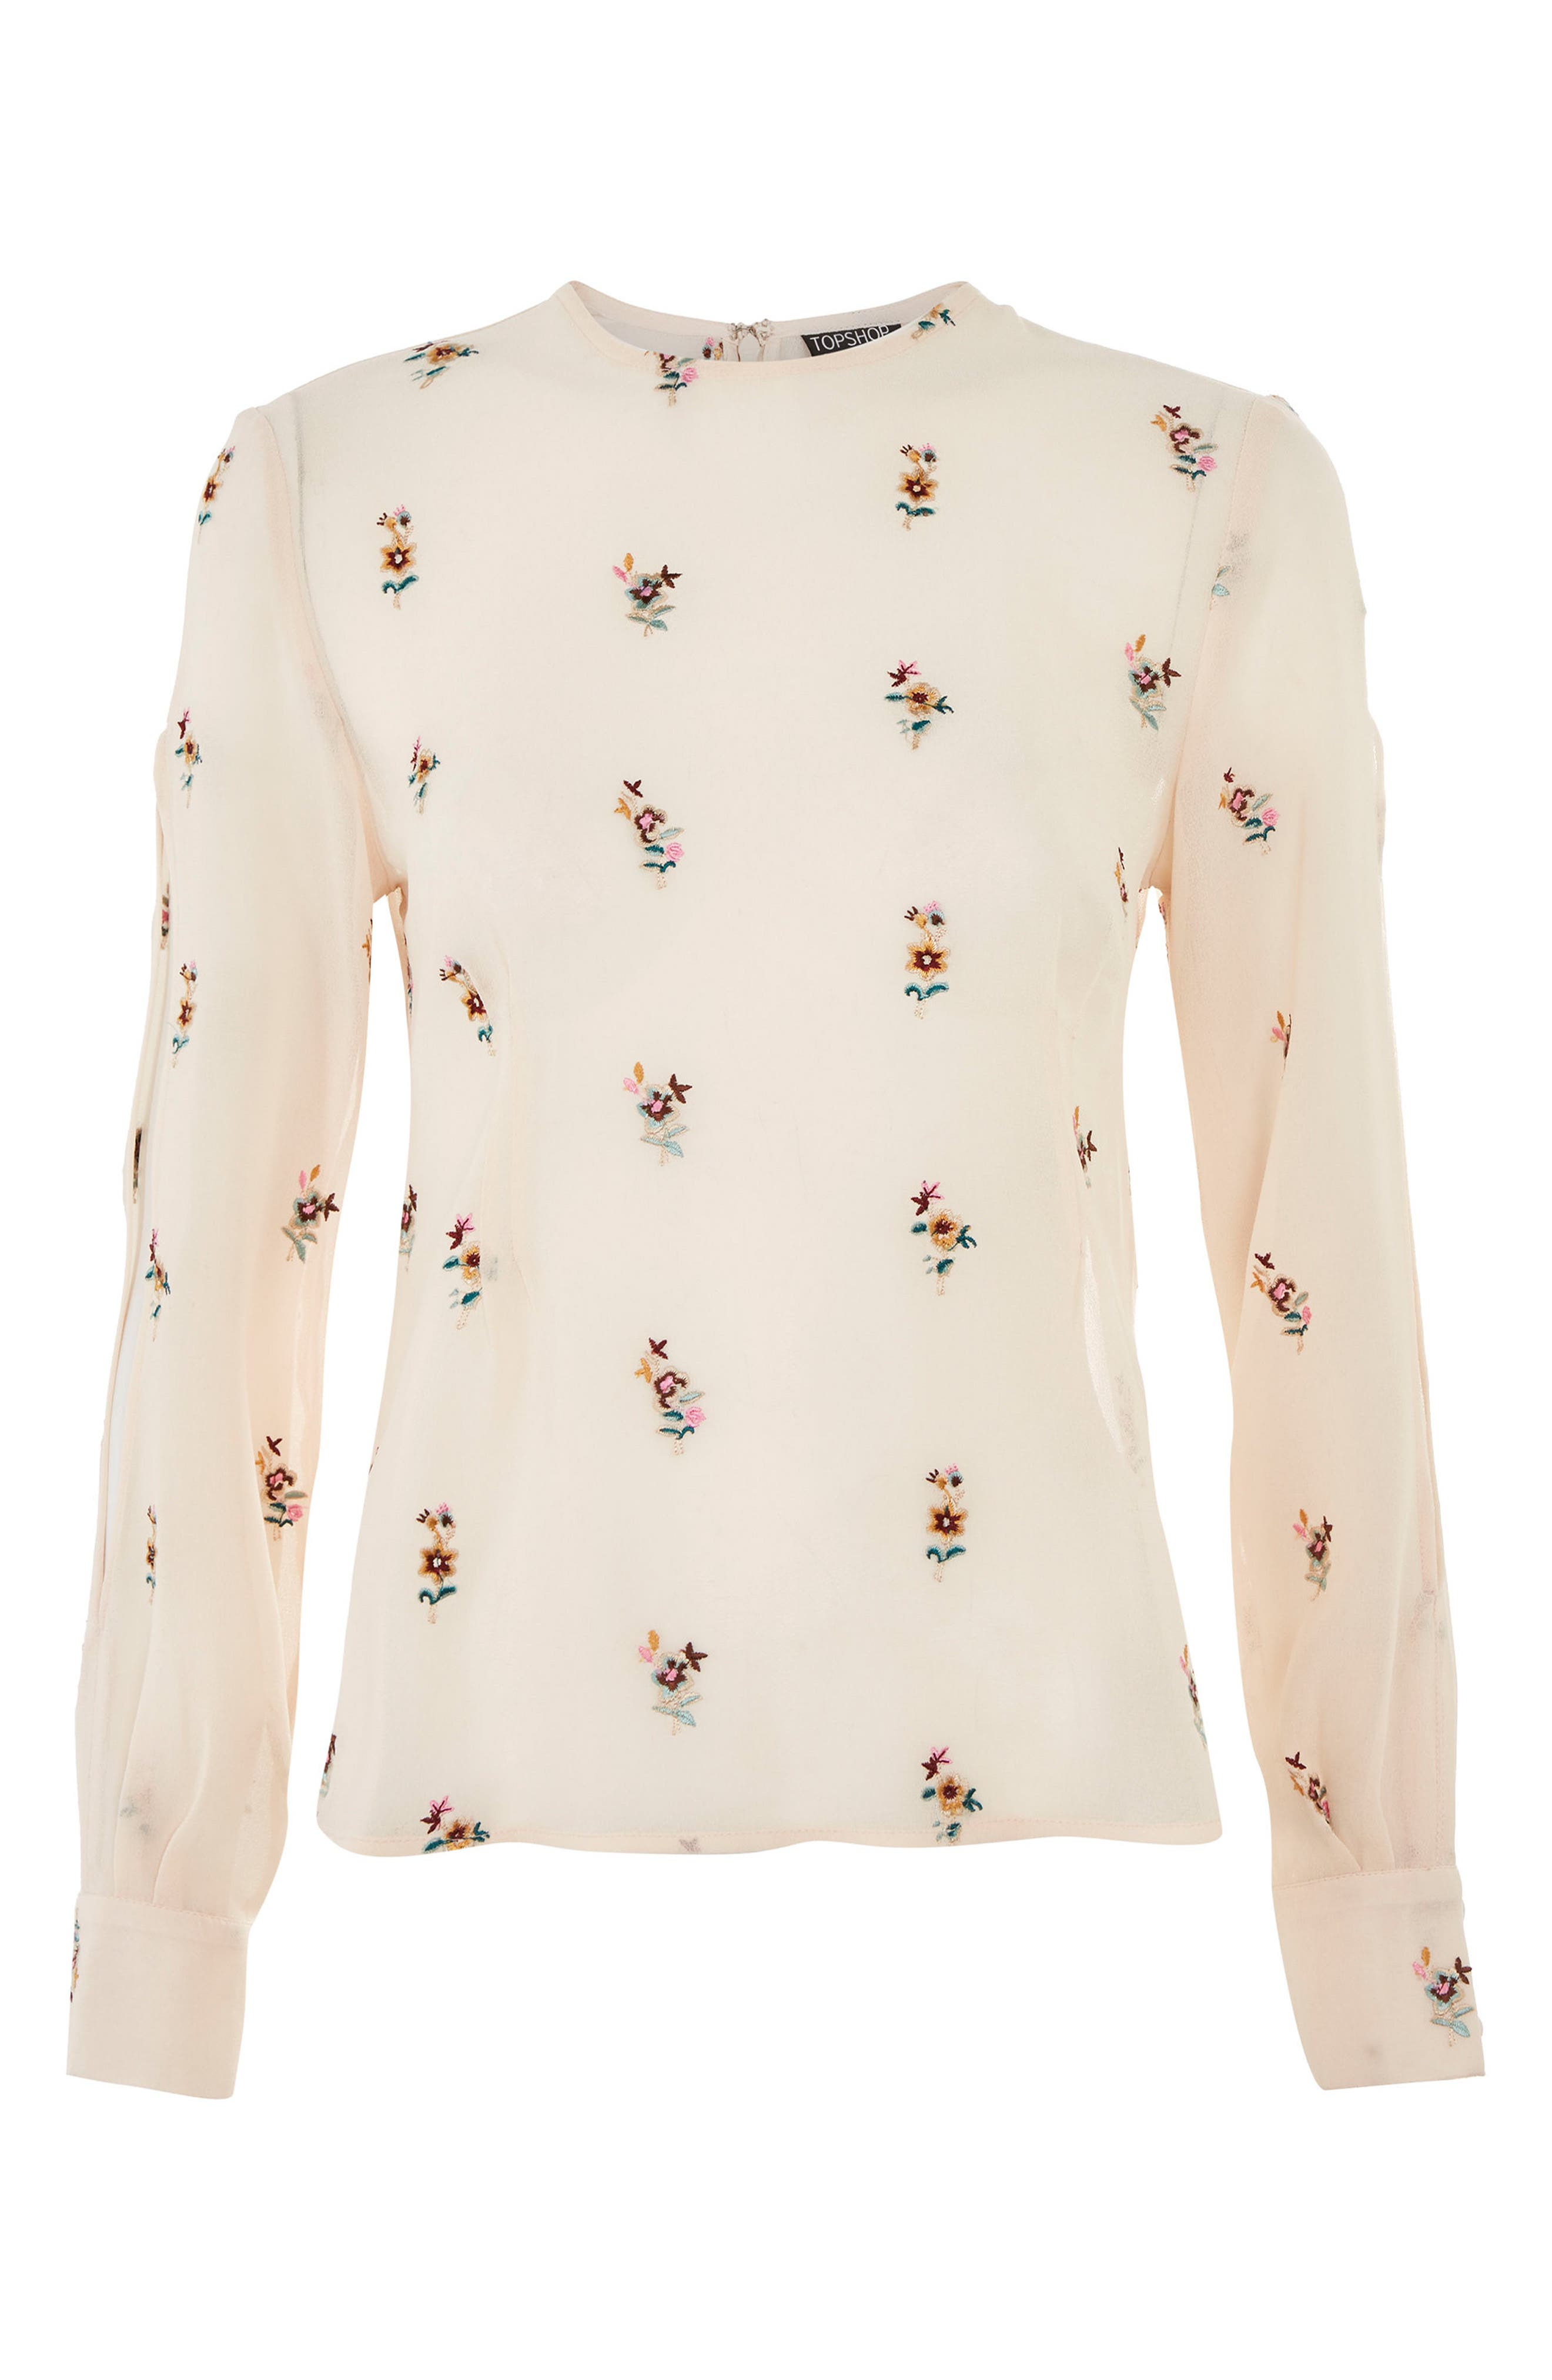 Alternate Image 1 Selected - Topshop Floral Embroidered Split Sleeve Top